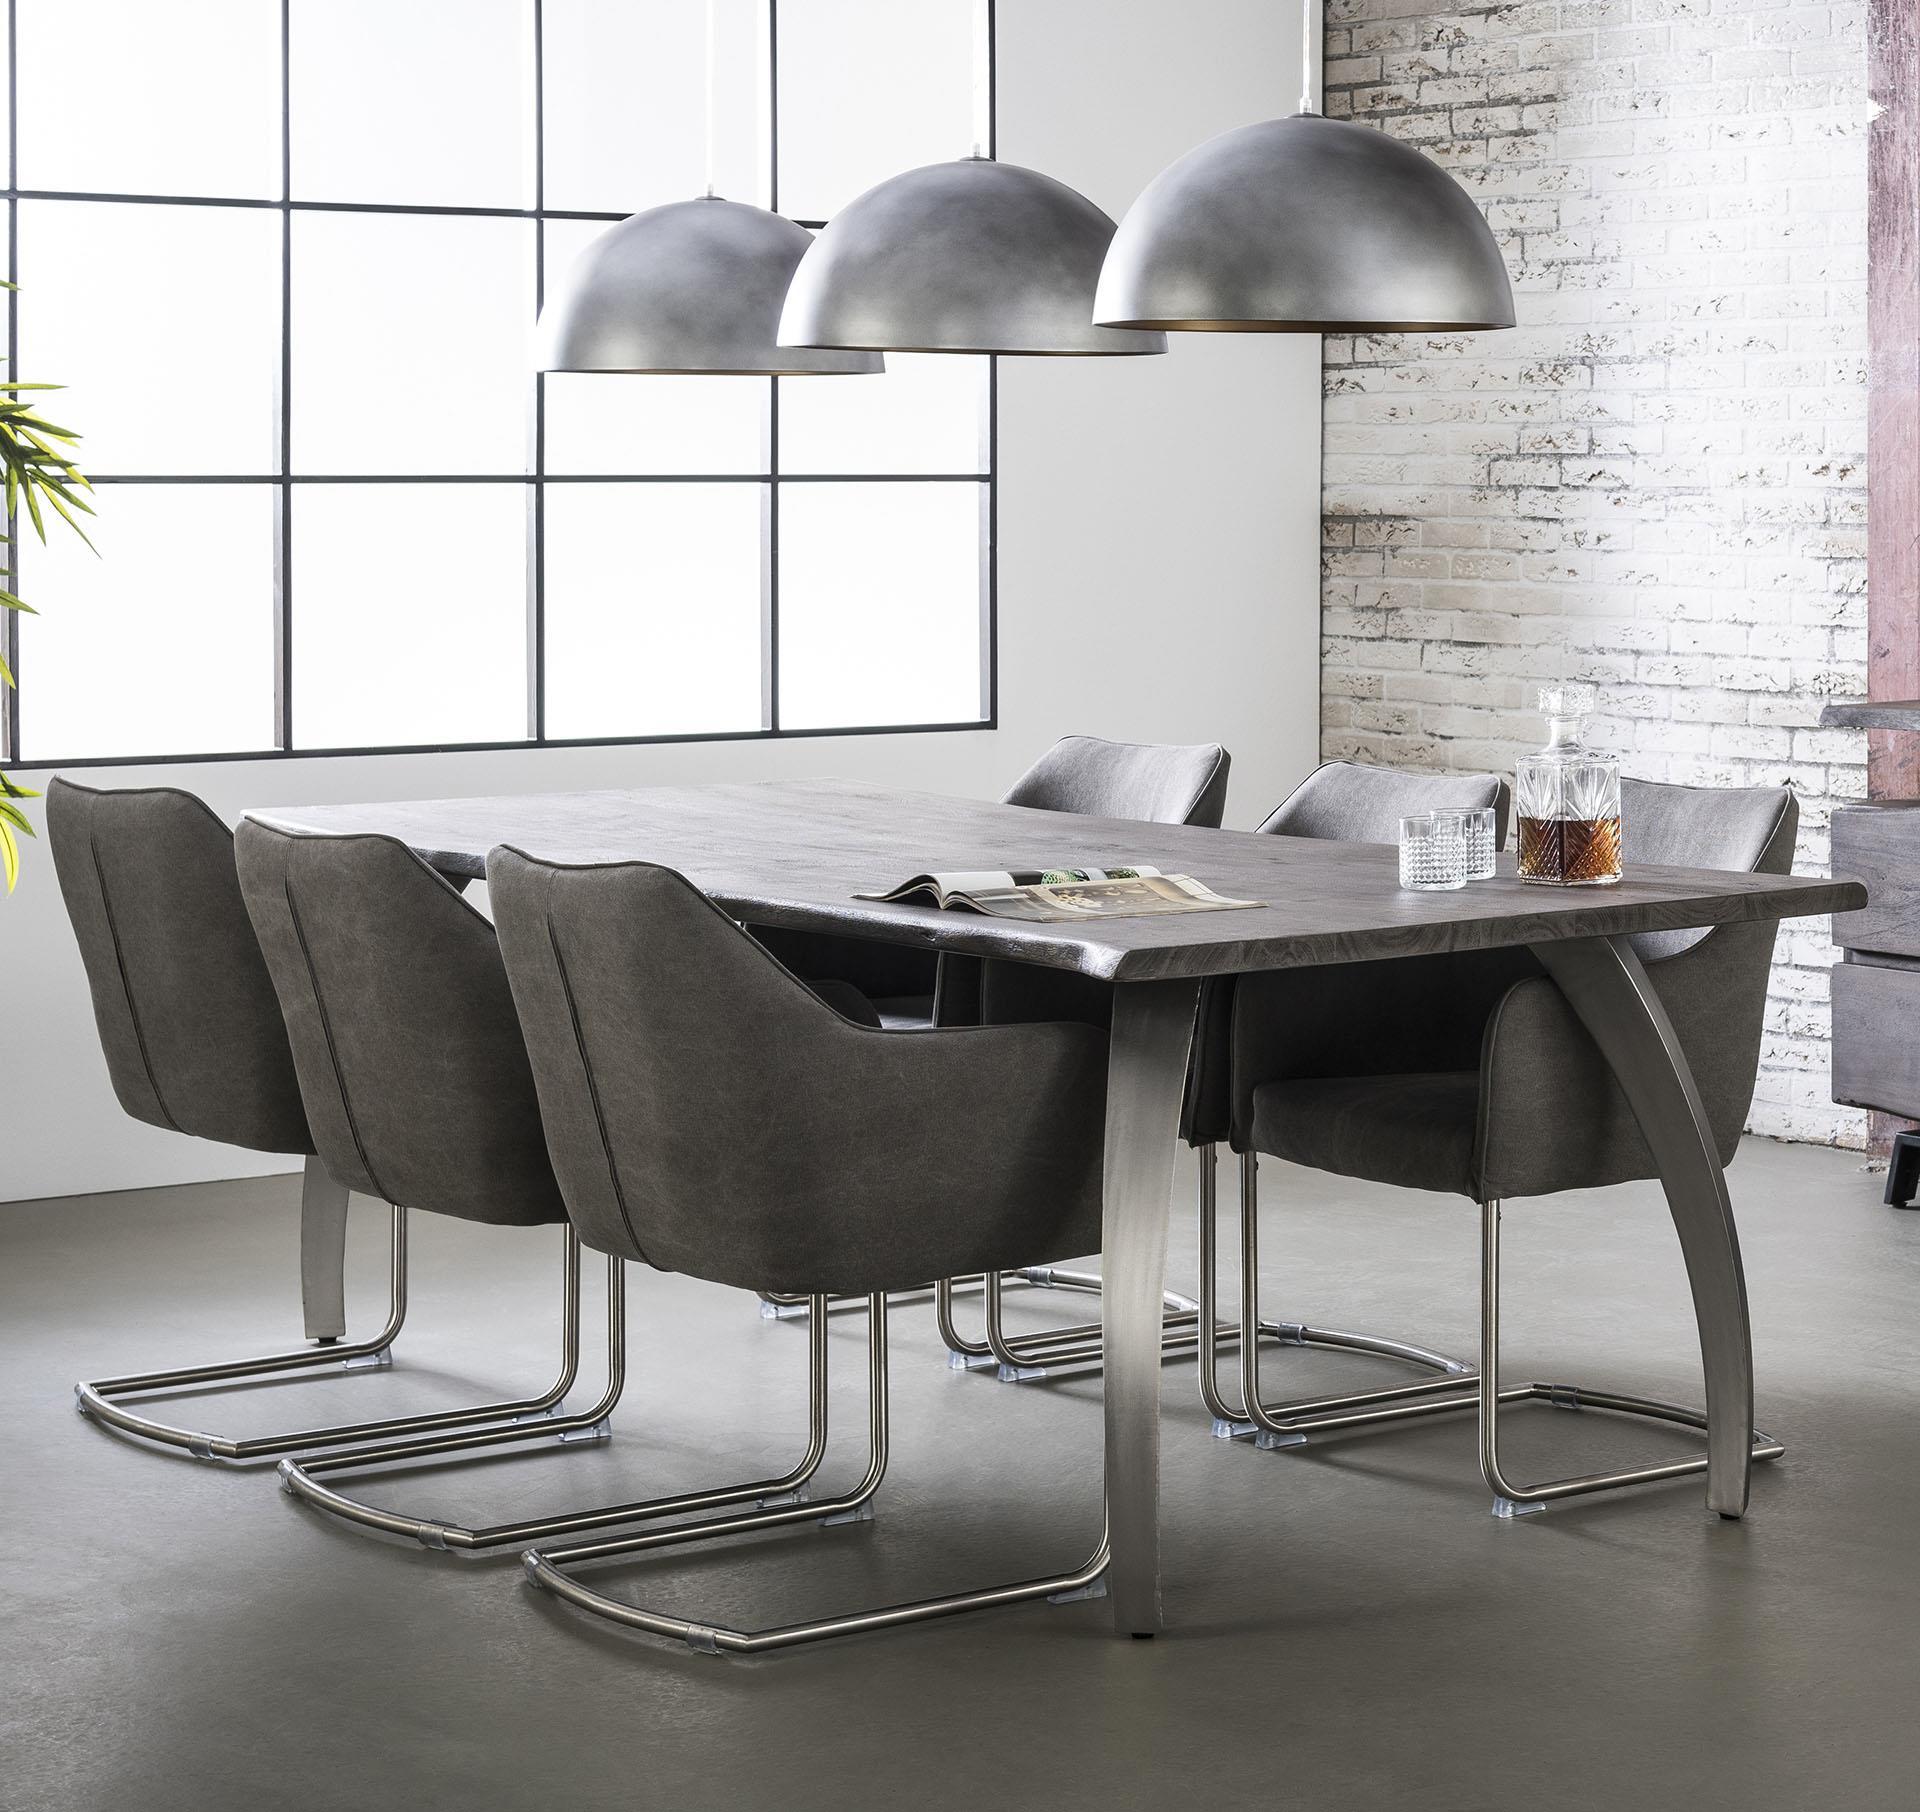 Eettafel 'Stam' 200 x 100cm, kleur leem